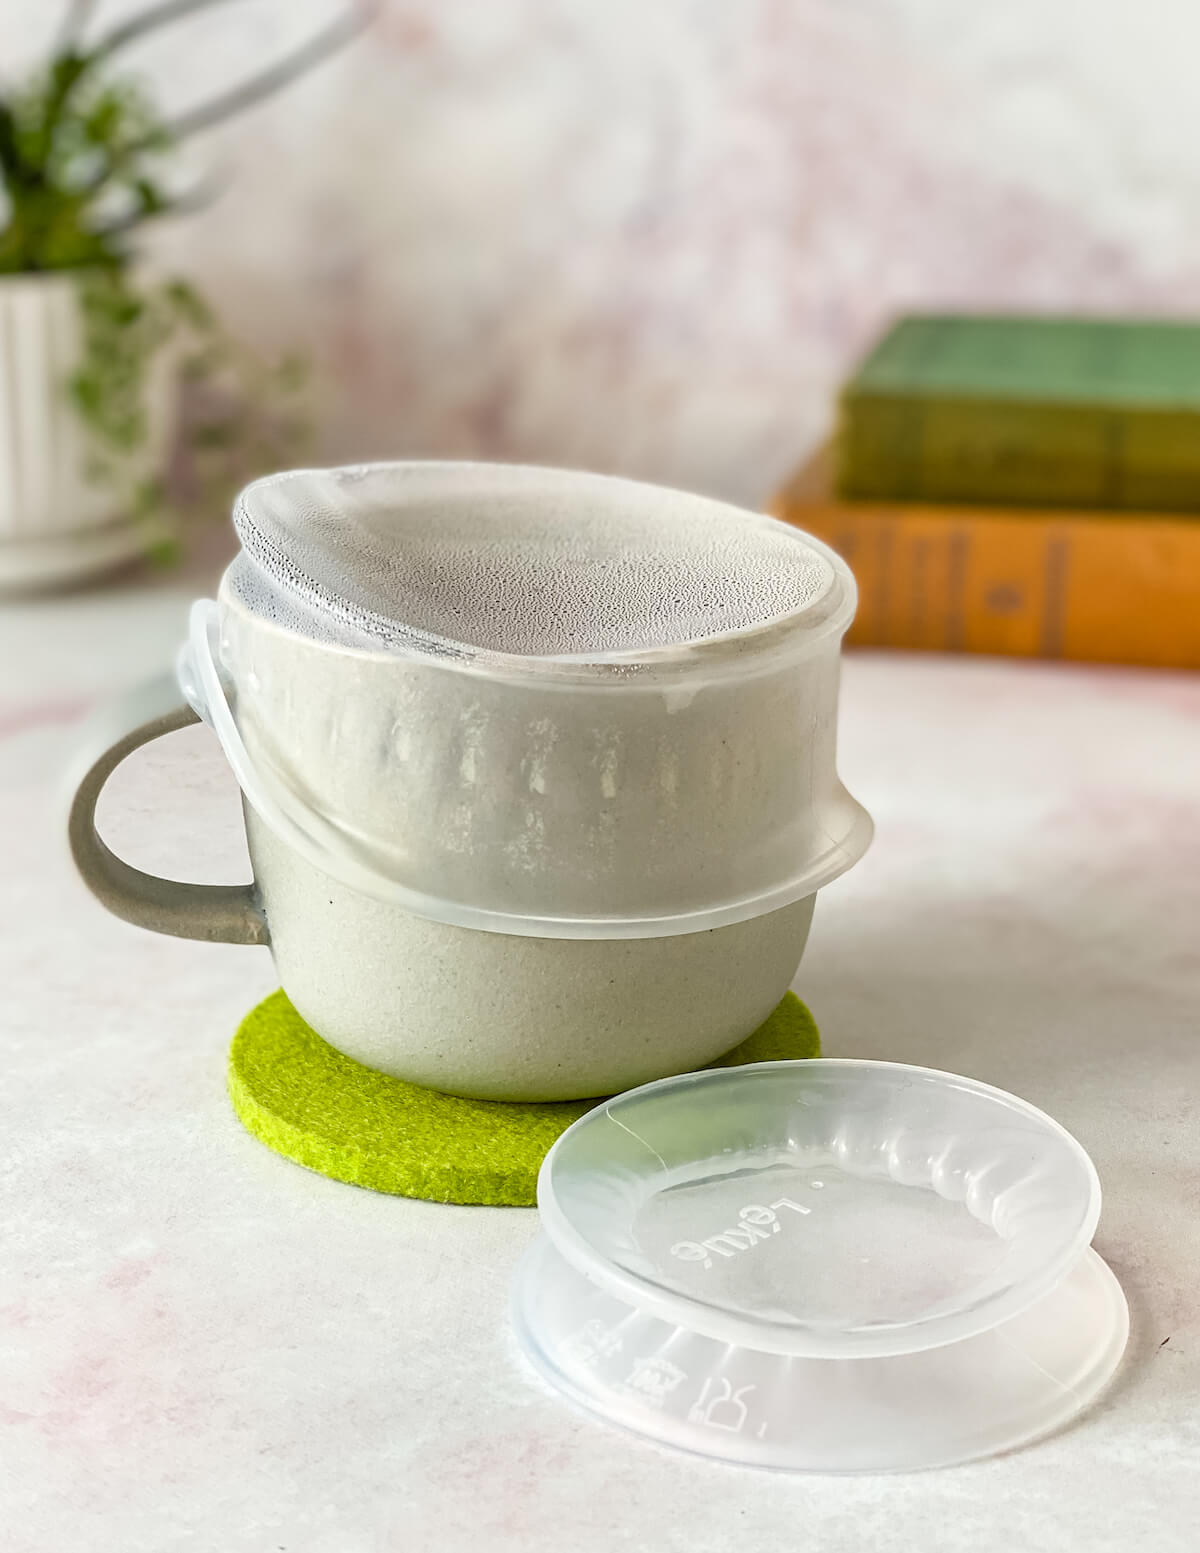 Lekue brand mini silicone lid on tea cup